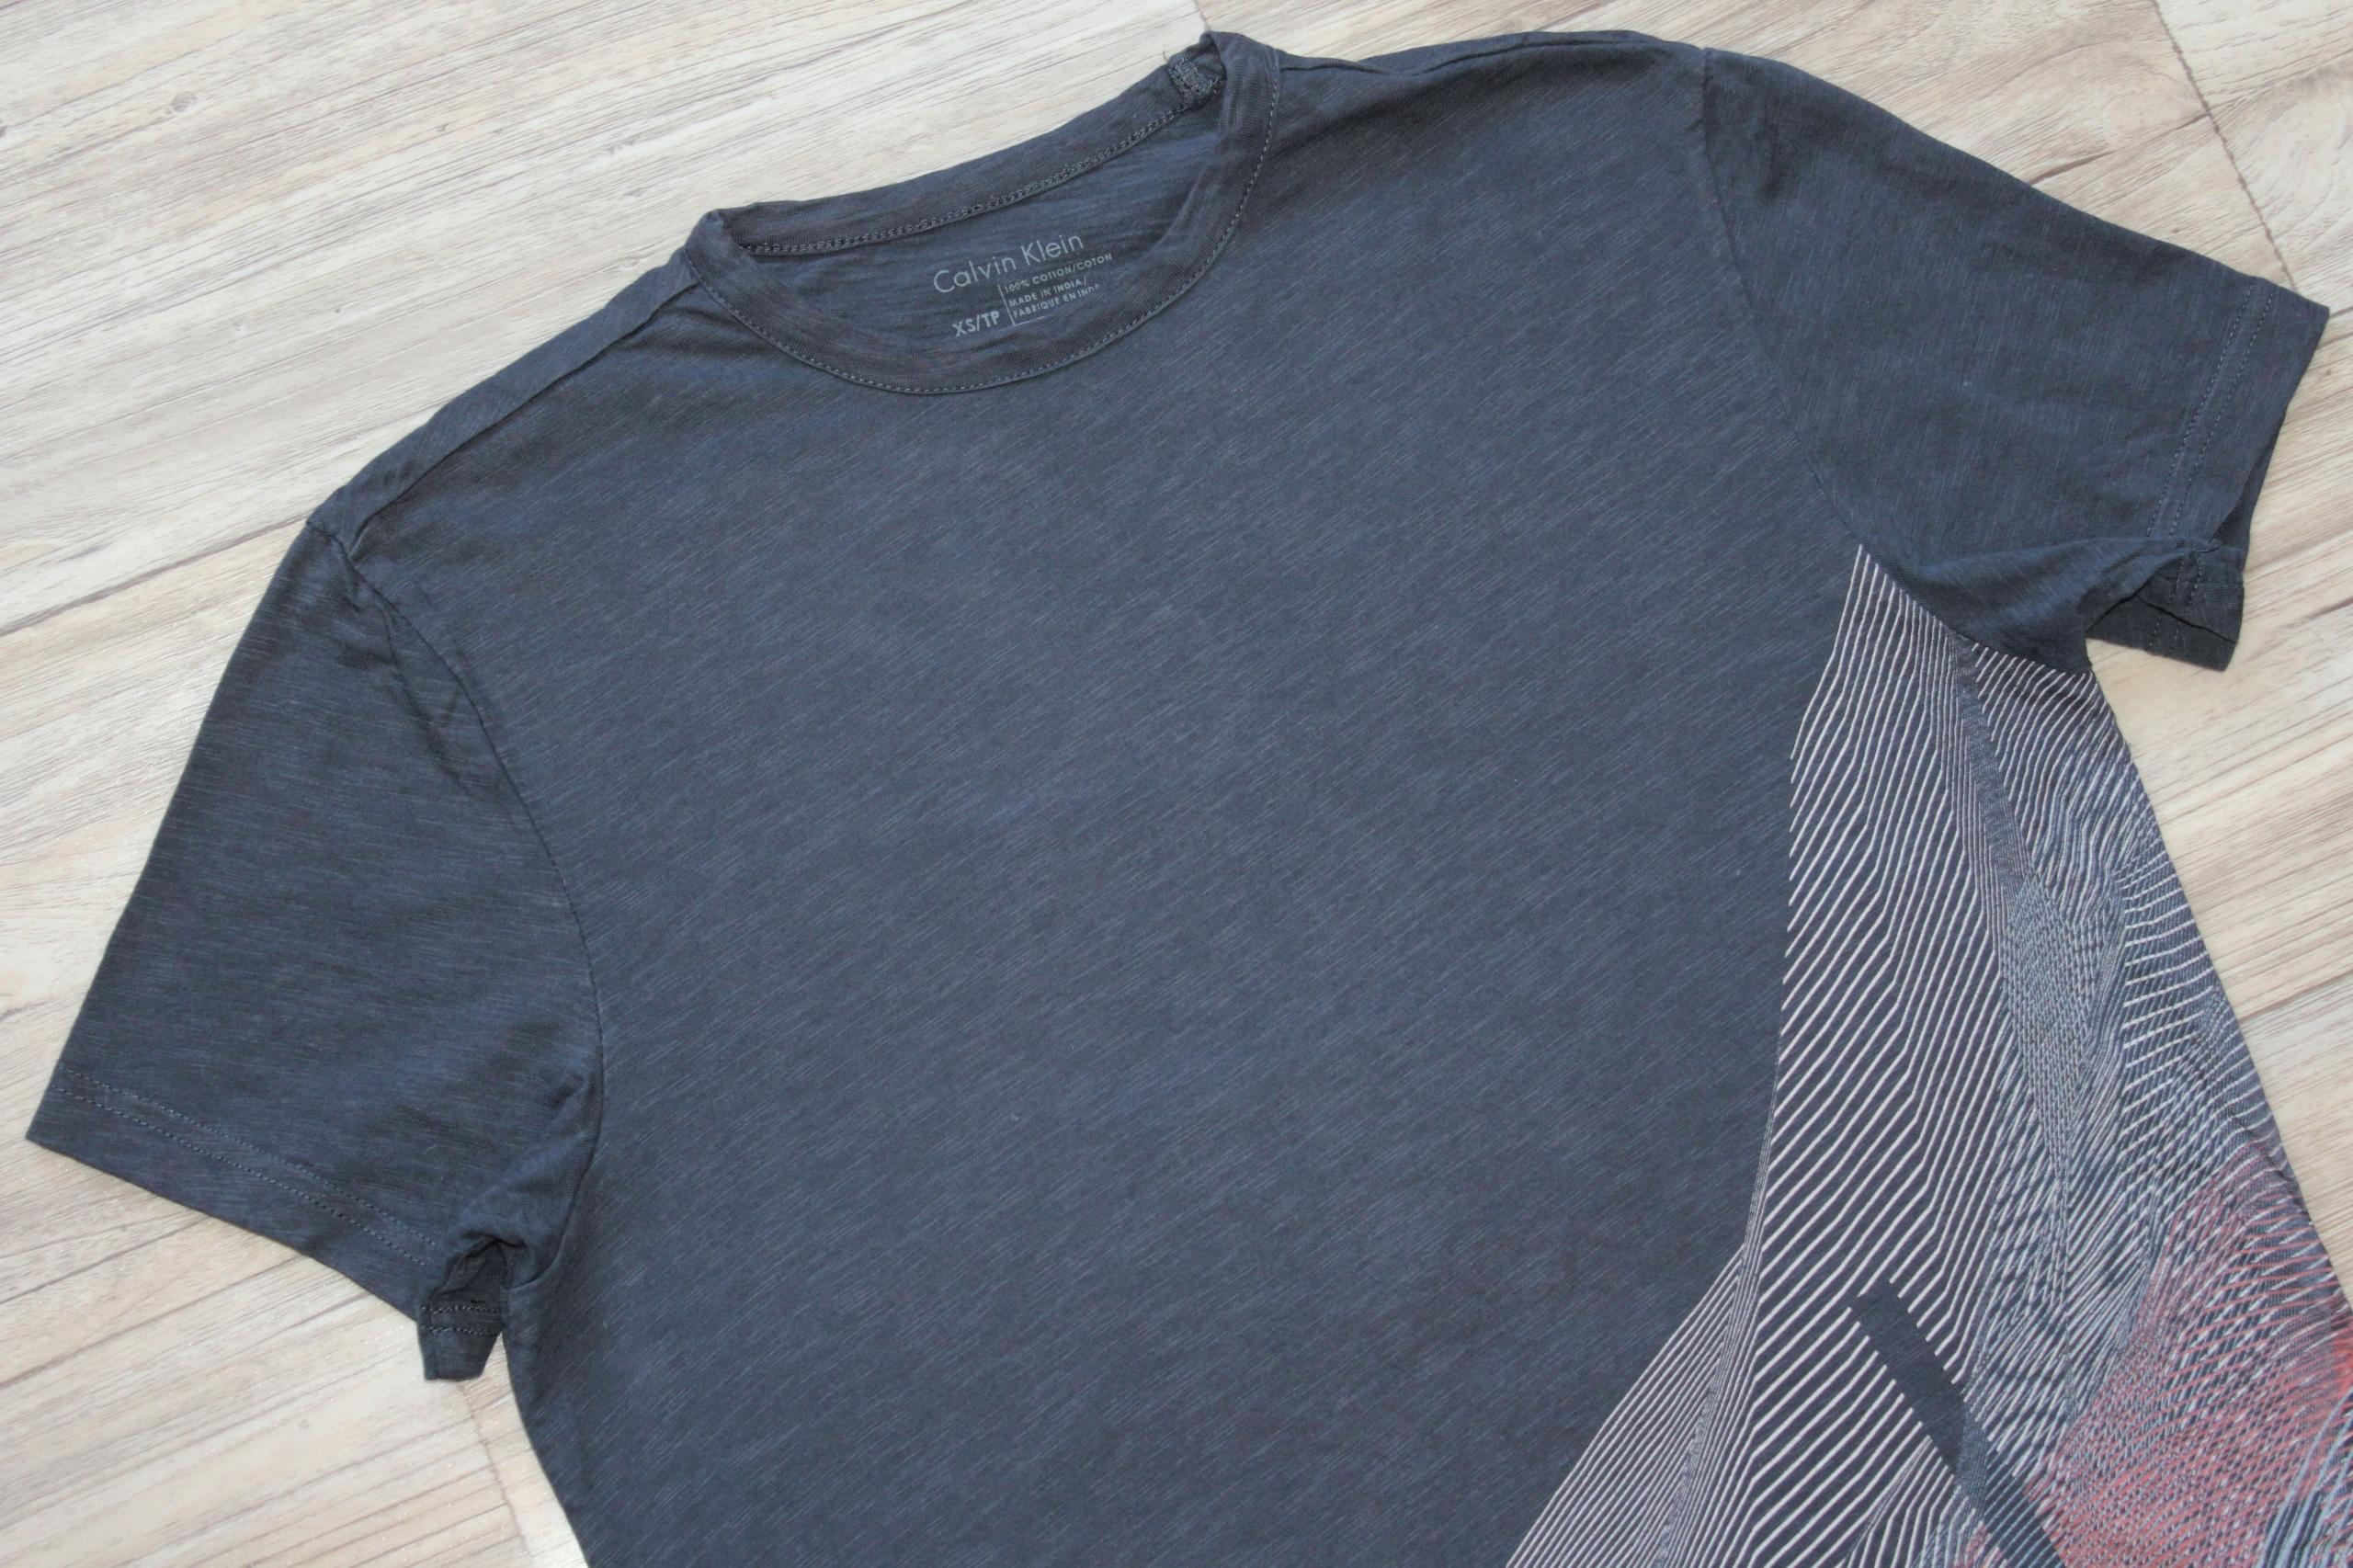 Bluzka koszulka t-shirt Calvin Klein CK bdb XS 34